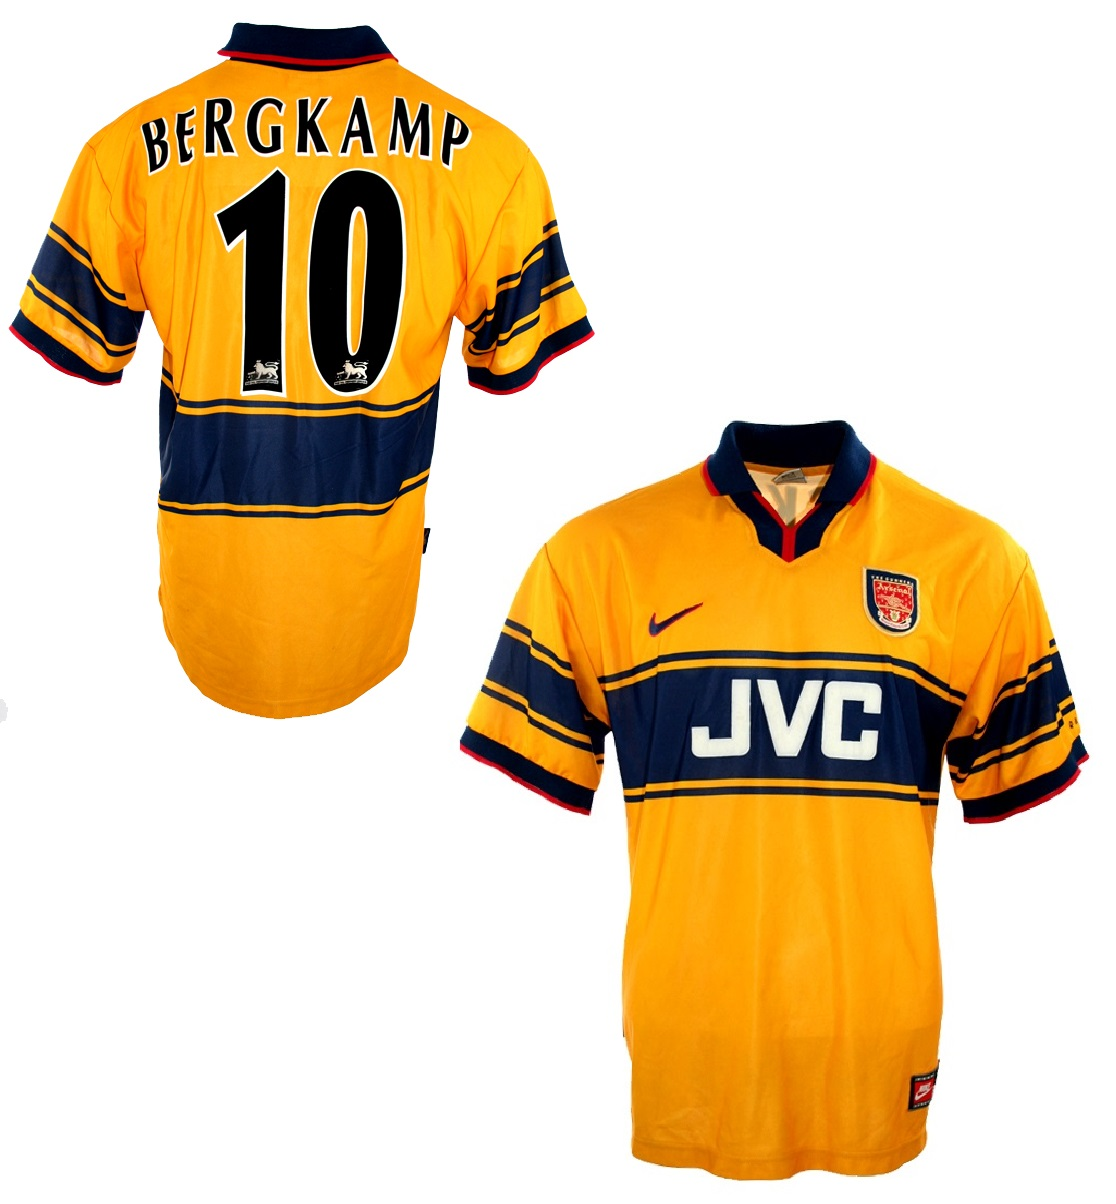 best service dcea3 aad79 Nike FC Arsenal jersey JVC 10 Dennis Bergkamp 1997-99 JVC ...